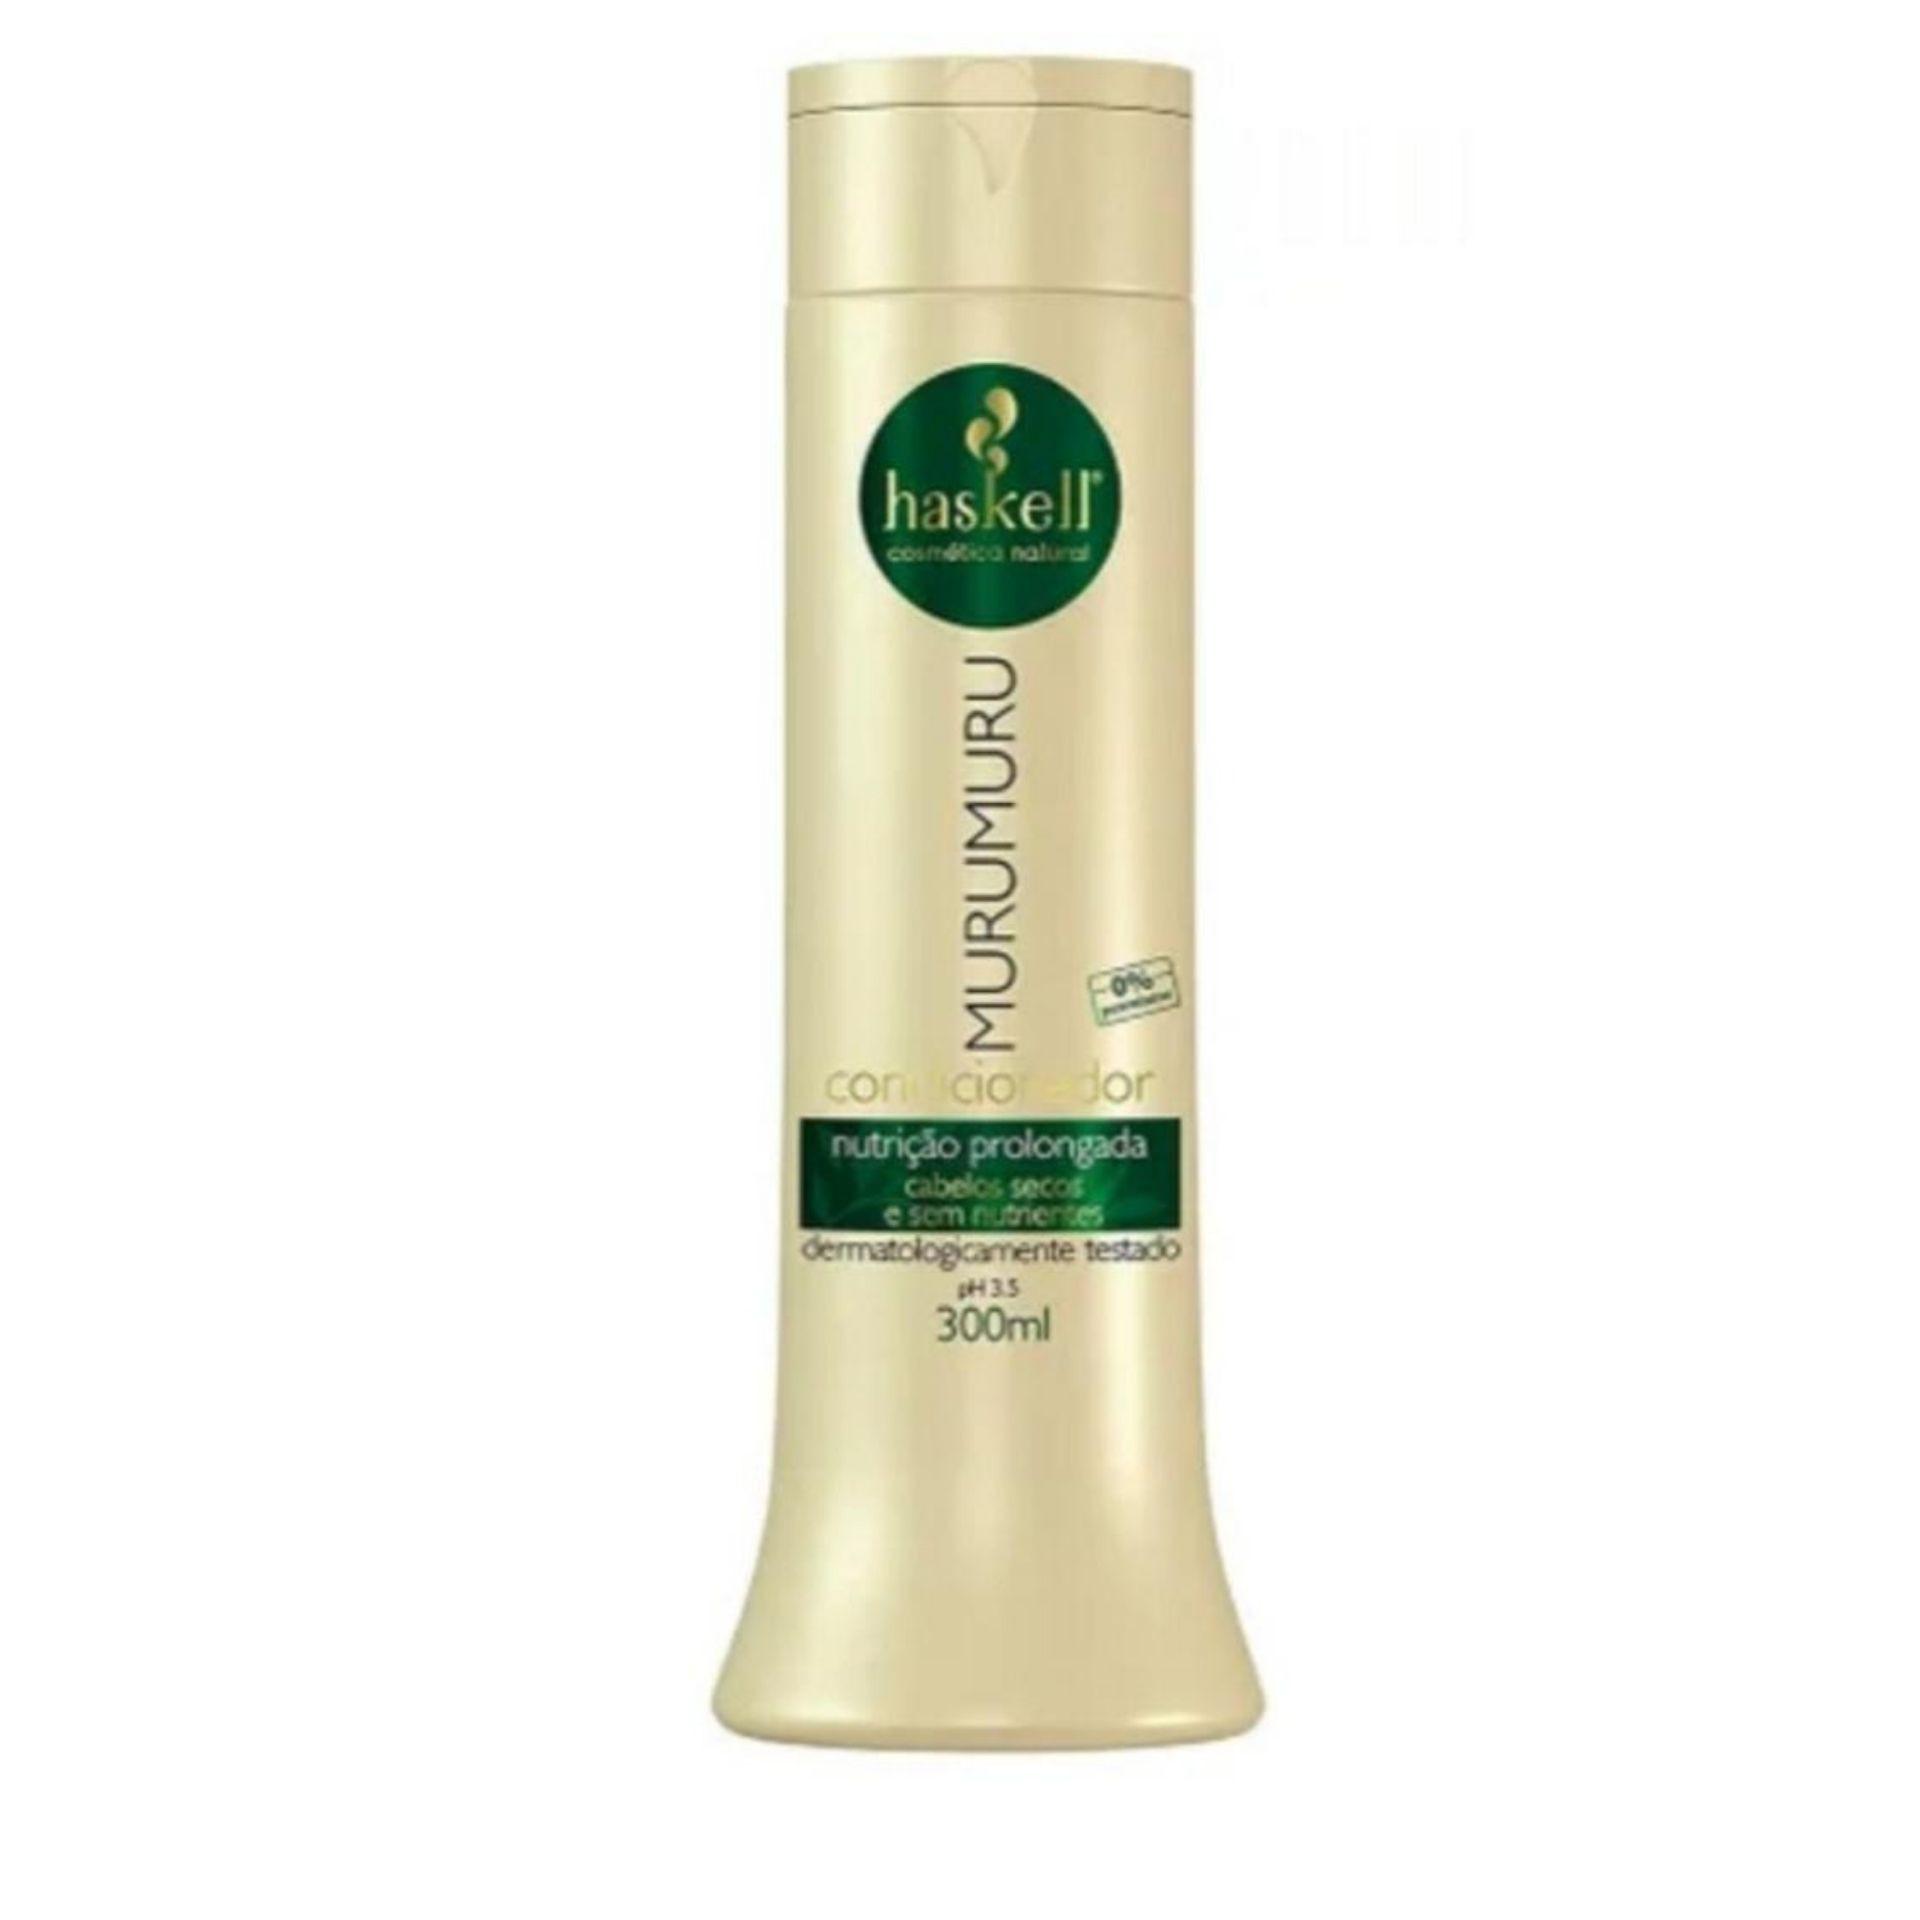 Shampoo Murumuru  Nutrição Prologada Haskel300ML